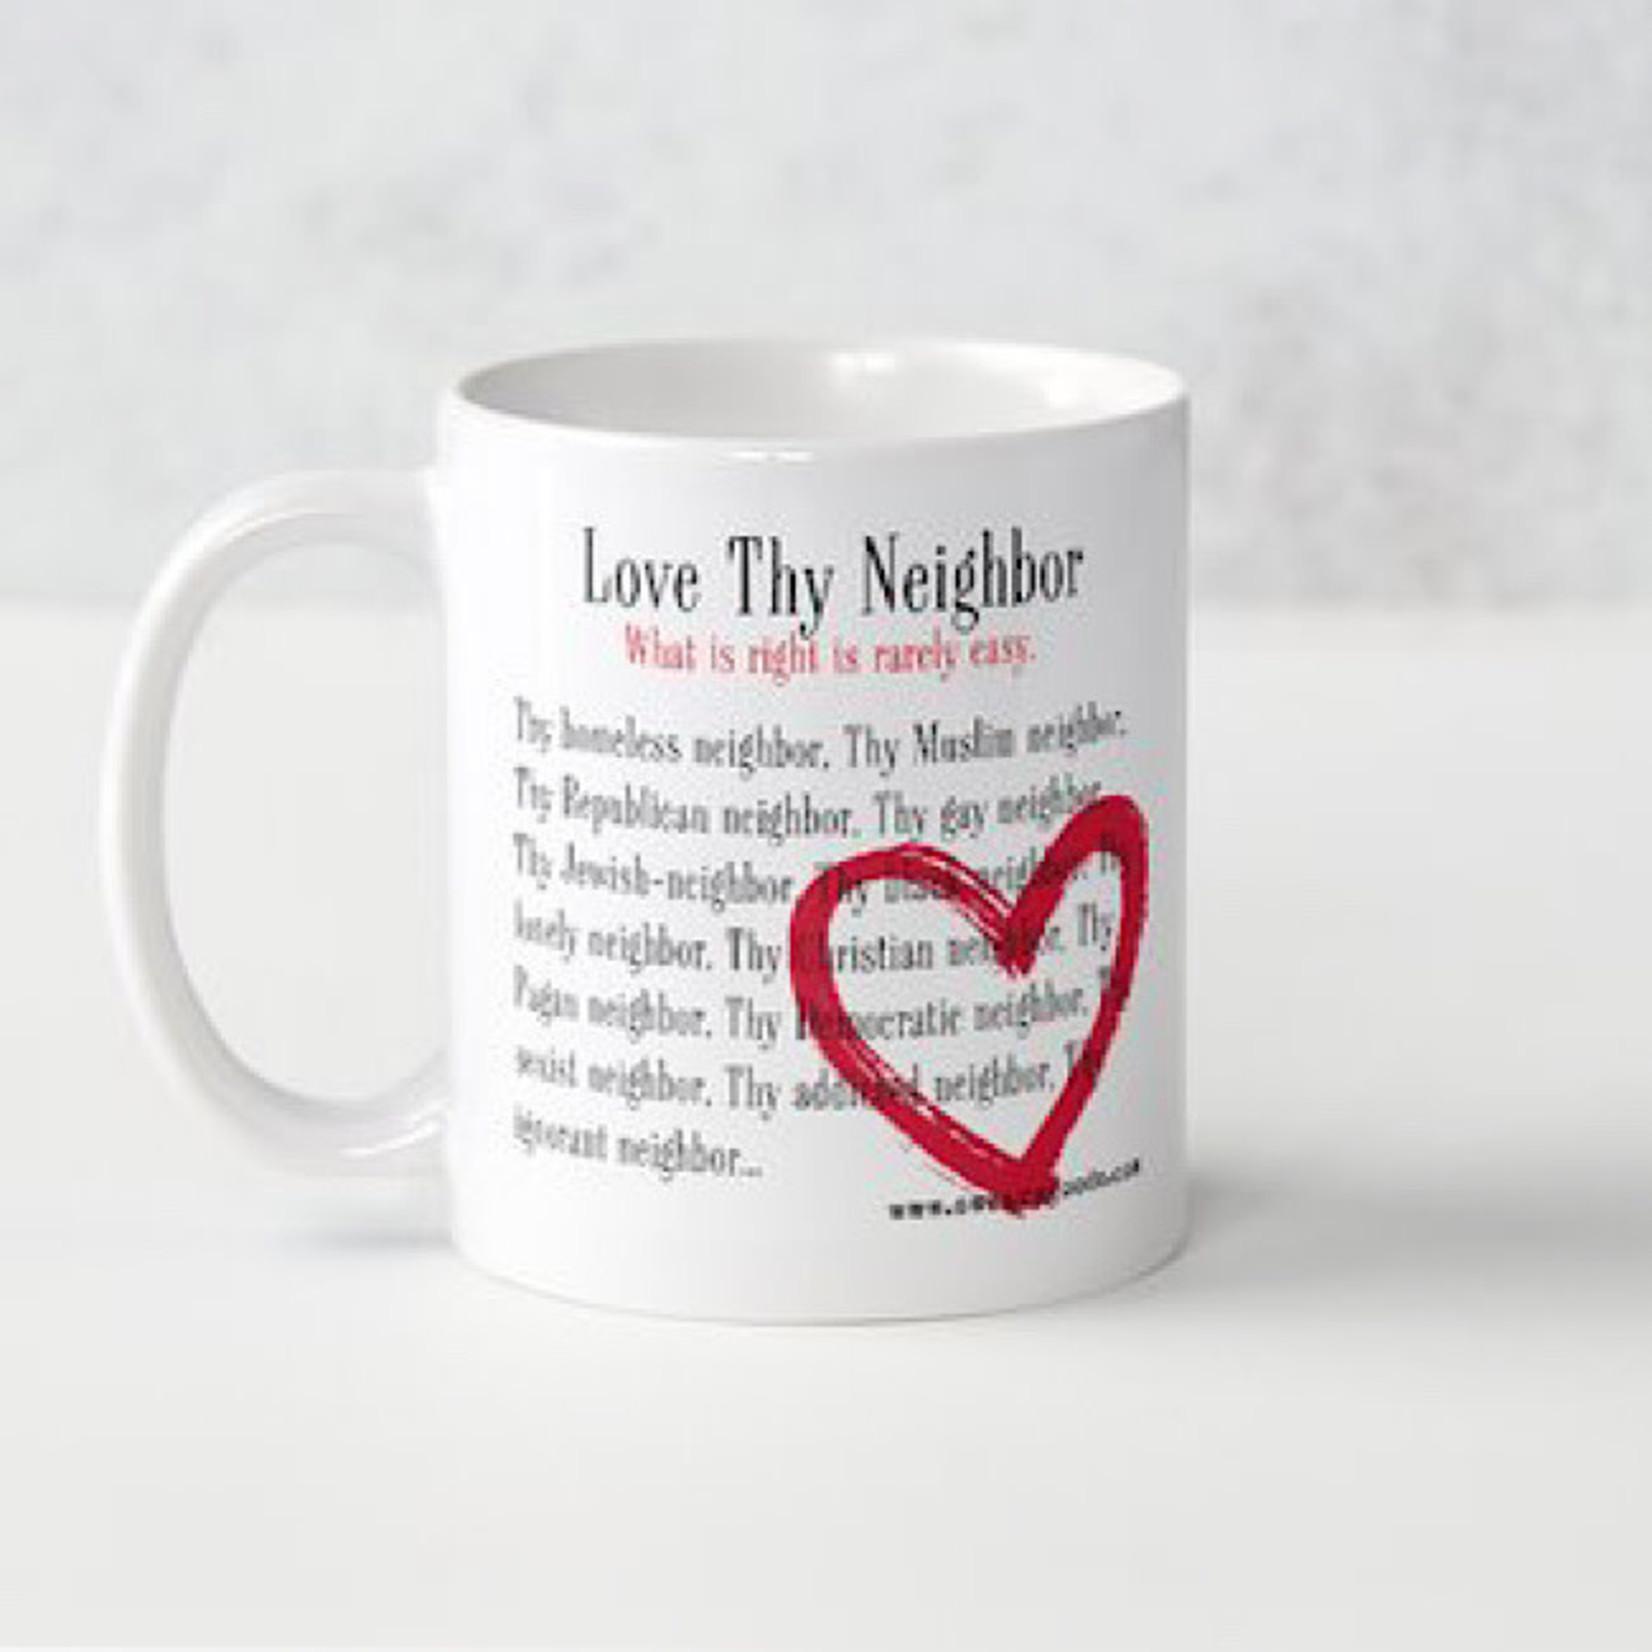 Bad Annie's Mug - Love Thy Neighbor